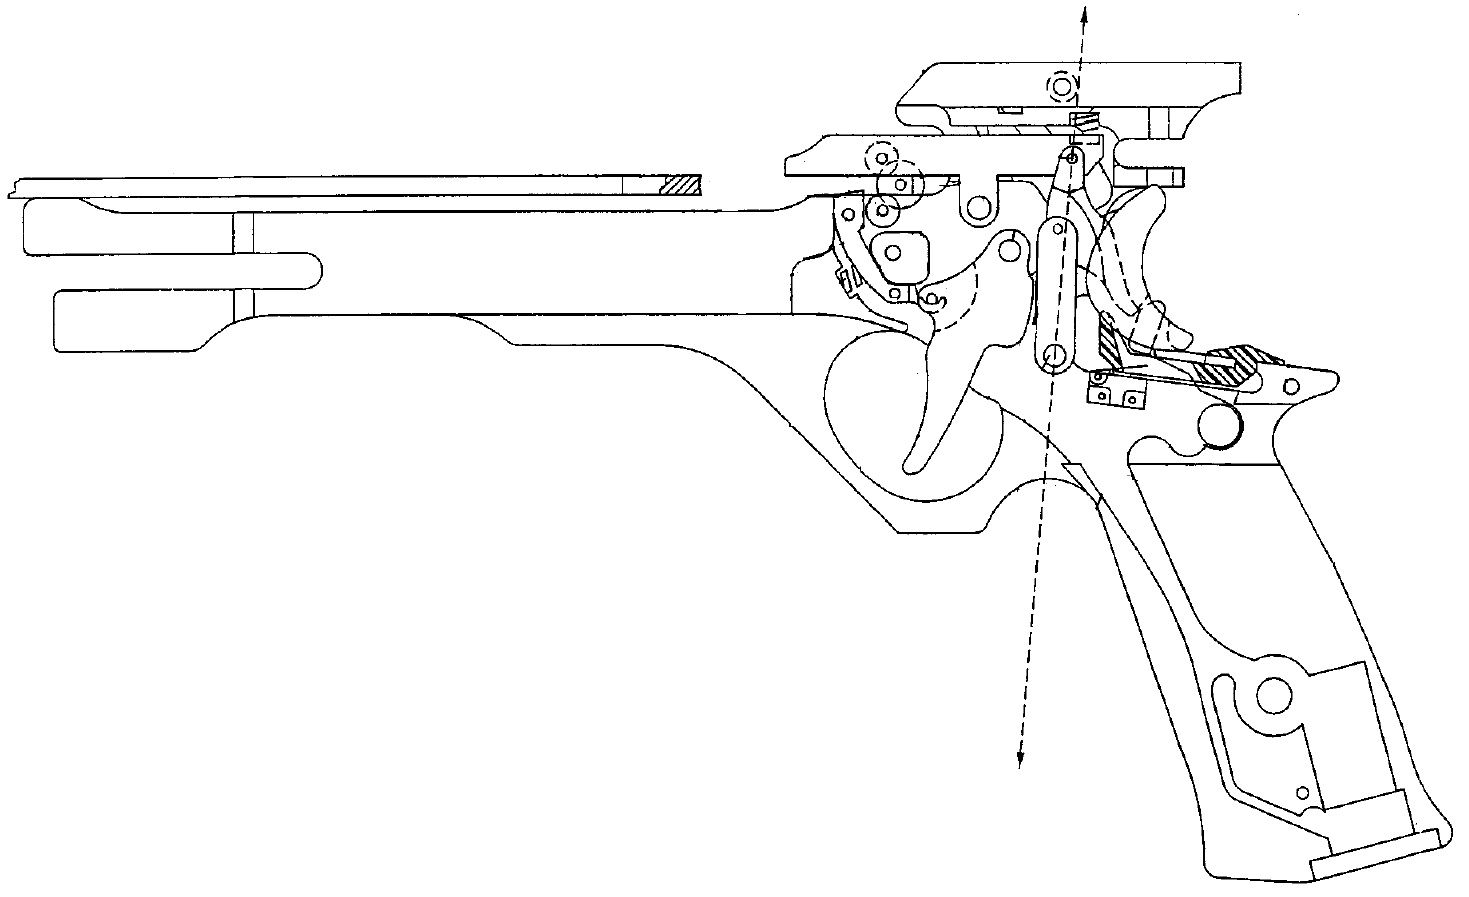 pistol diagram pedersoli howdah pistols diagram revivaler Crossbow Wallpaper medium resolution of hello all newbie here great site does naybody have a simple crossbow sniper